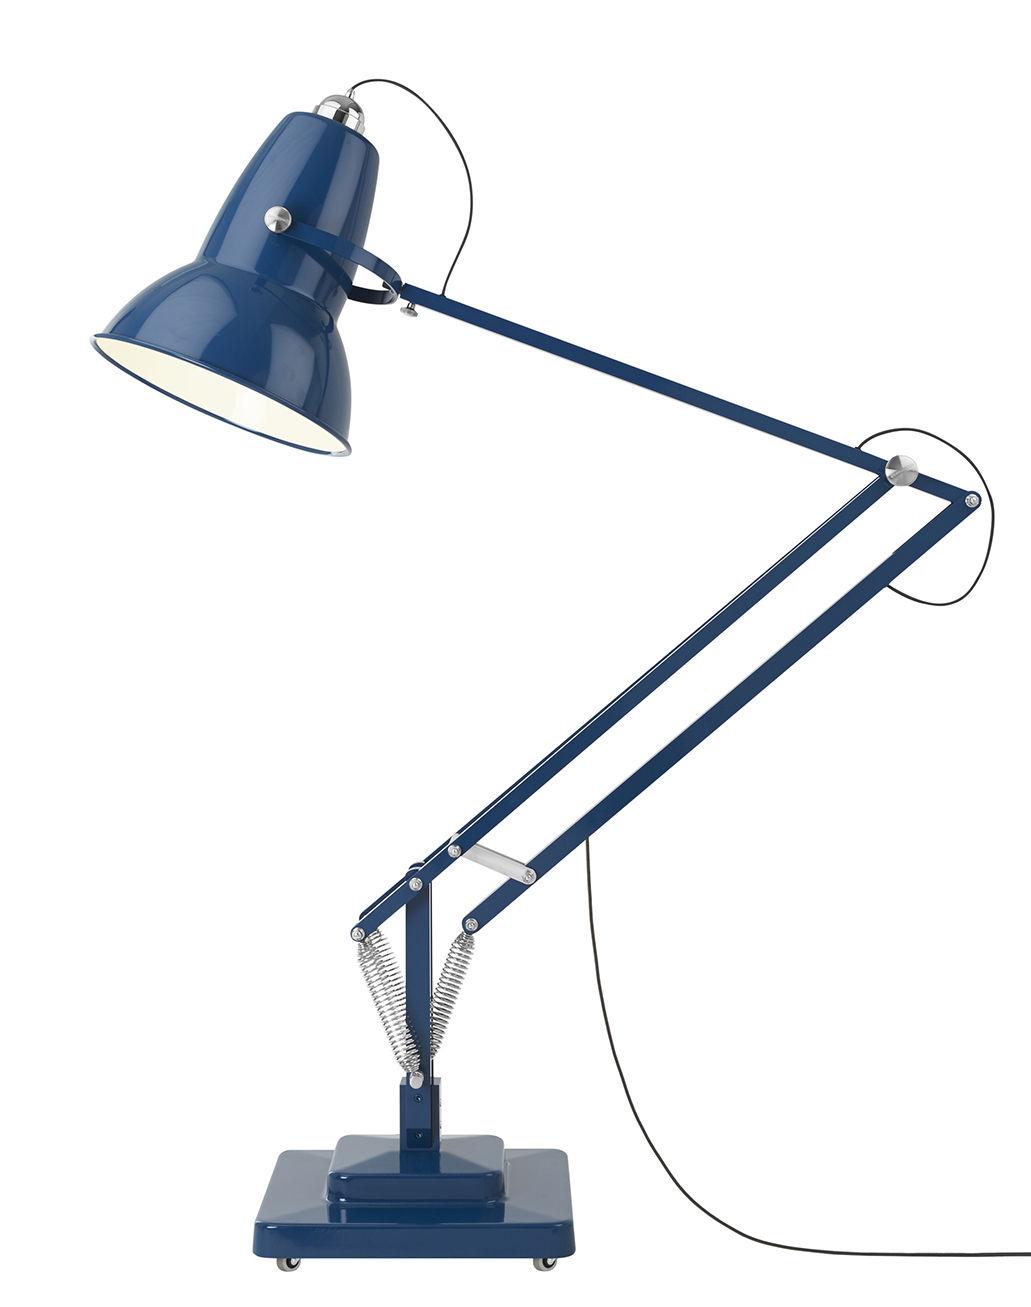 Lampadaire original 1227 giant outdoor h 270 cm bleu marine anglepoise - Luminaire industriel la giant collection par anglepoise ...